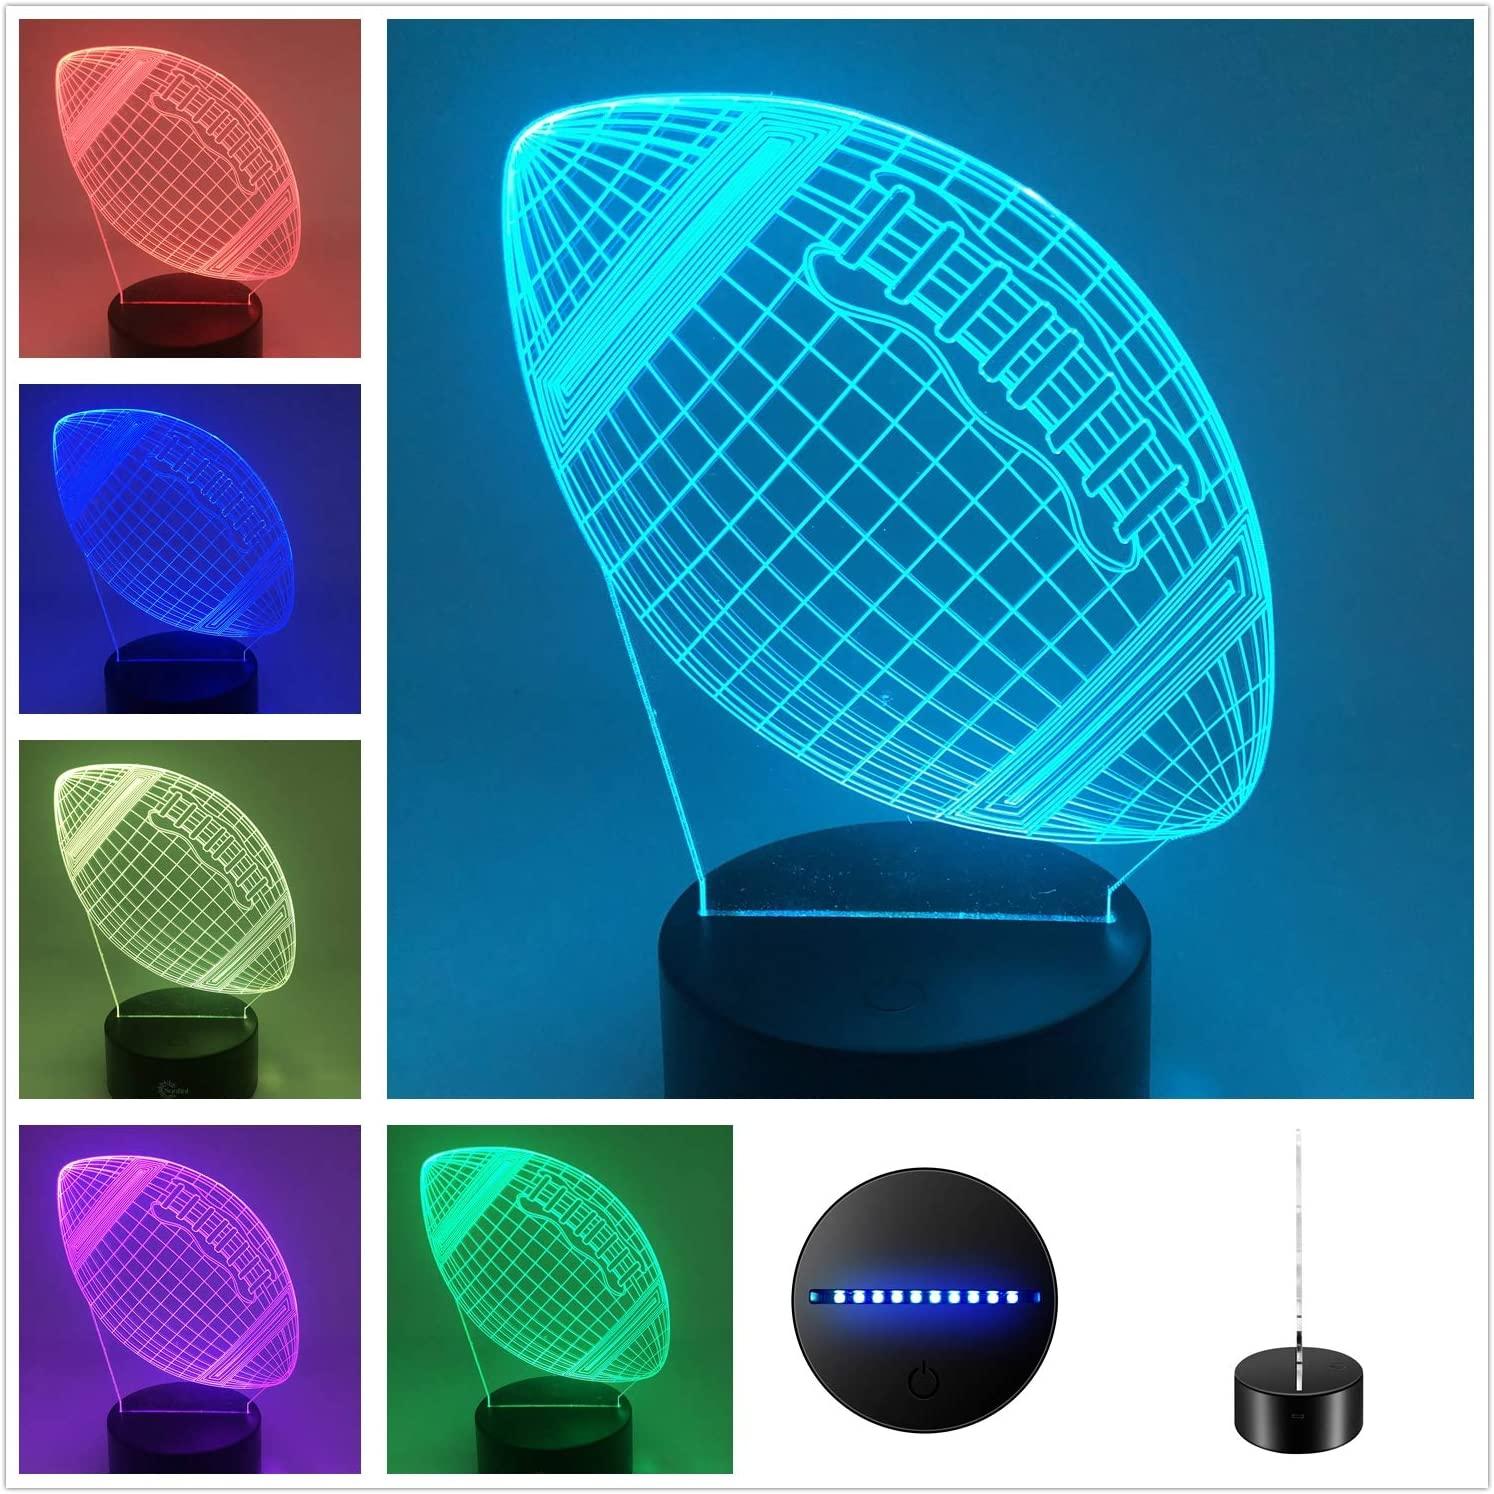 DowBier 3D Illusion Multi Colors USB Sleeping Night Light Desk Lamp Room Decoration (Football)